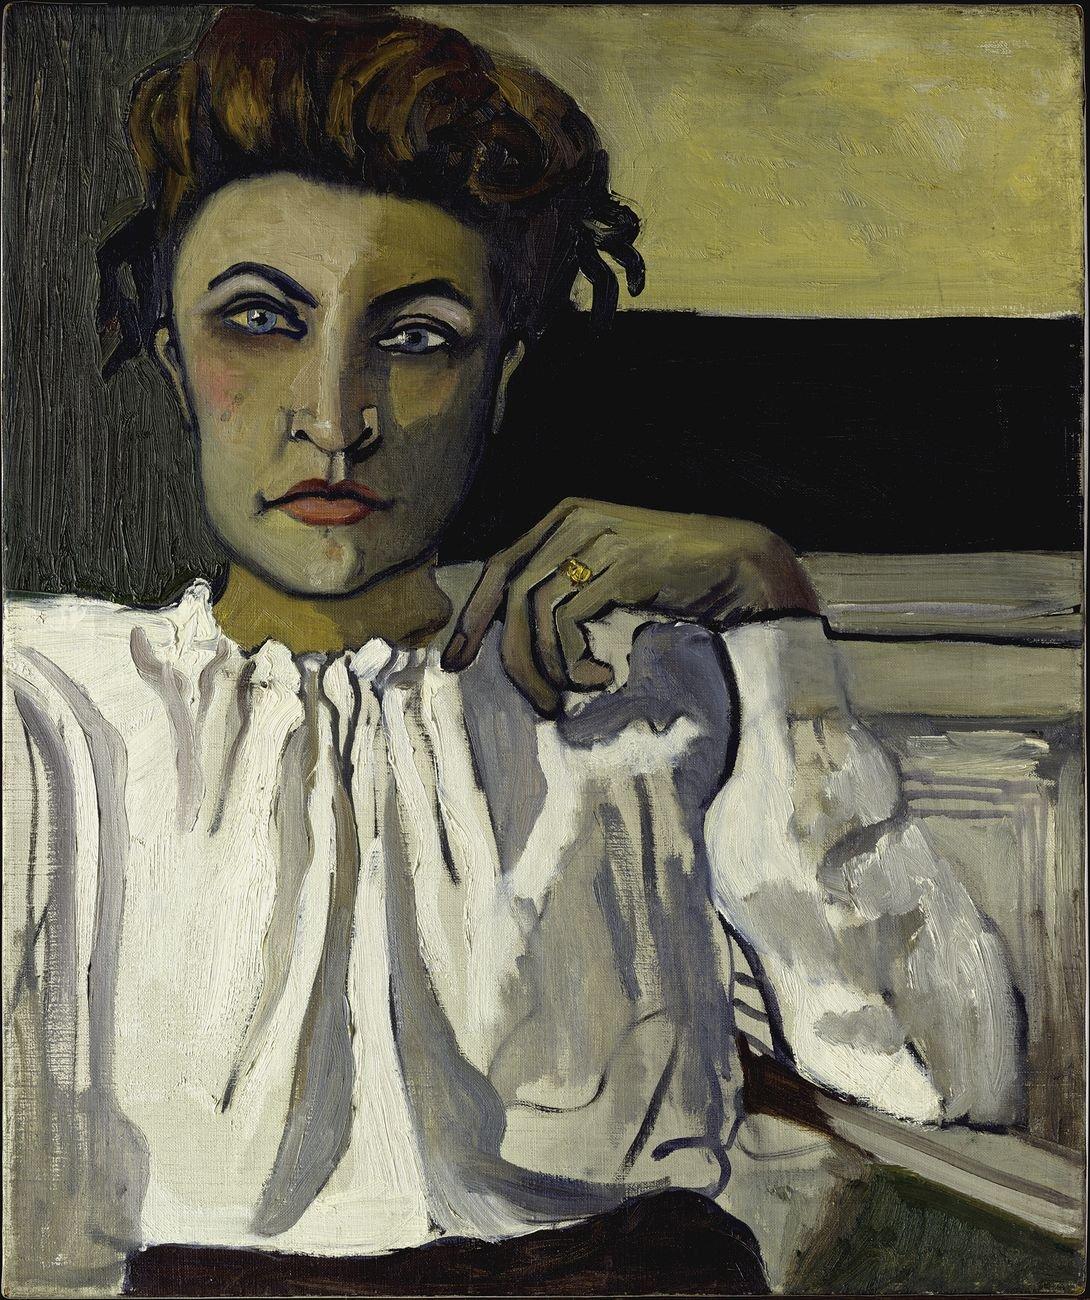 Alice Neel, Elenka, 1936, olio su tela, 61 × 50,8 cm. The Metropolitan Museum, New York, donazione di Richard Neel e Hartley S. Neel, 1987 © The Estate of Alice Neel, Bilbao, 2021